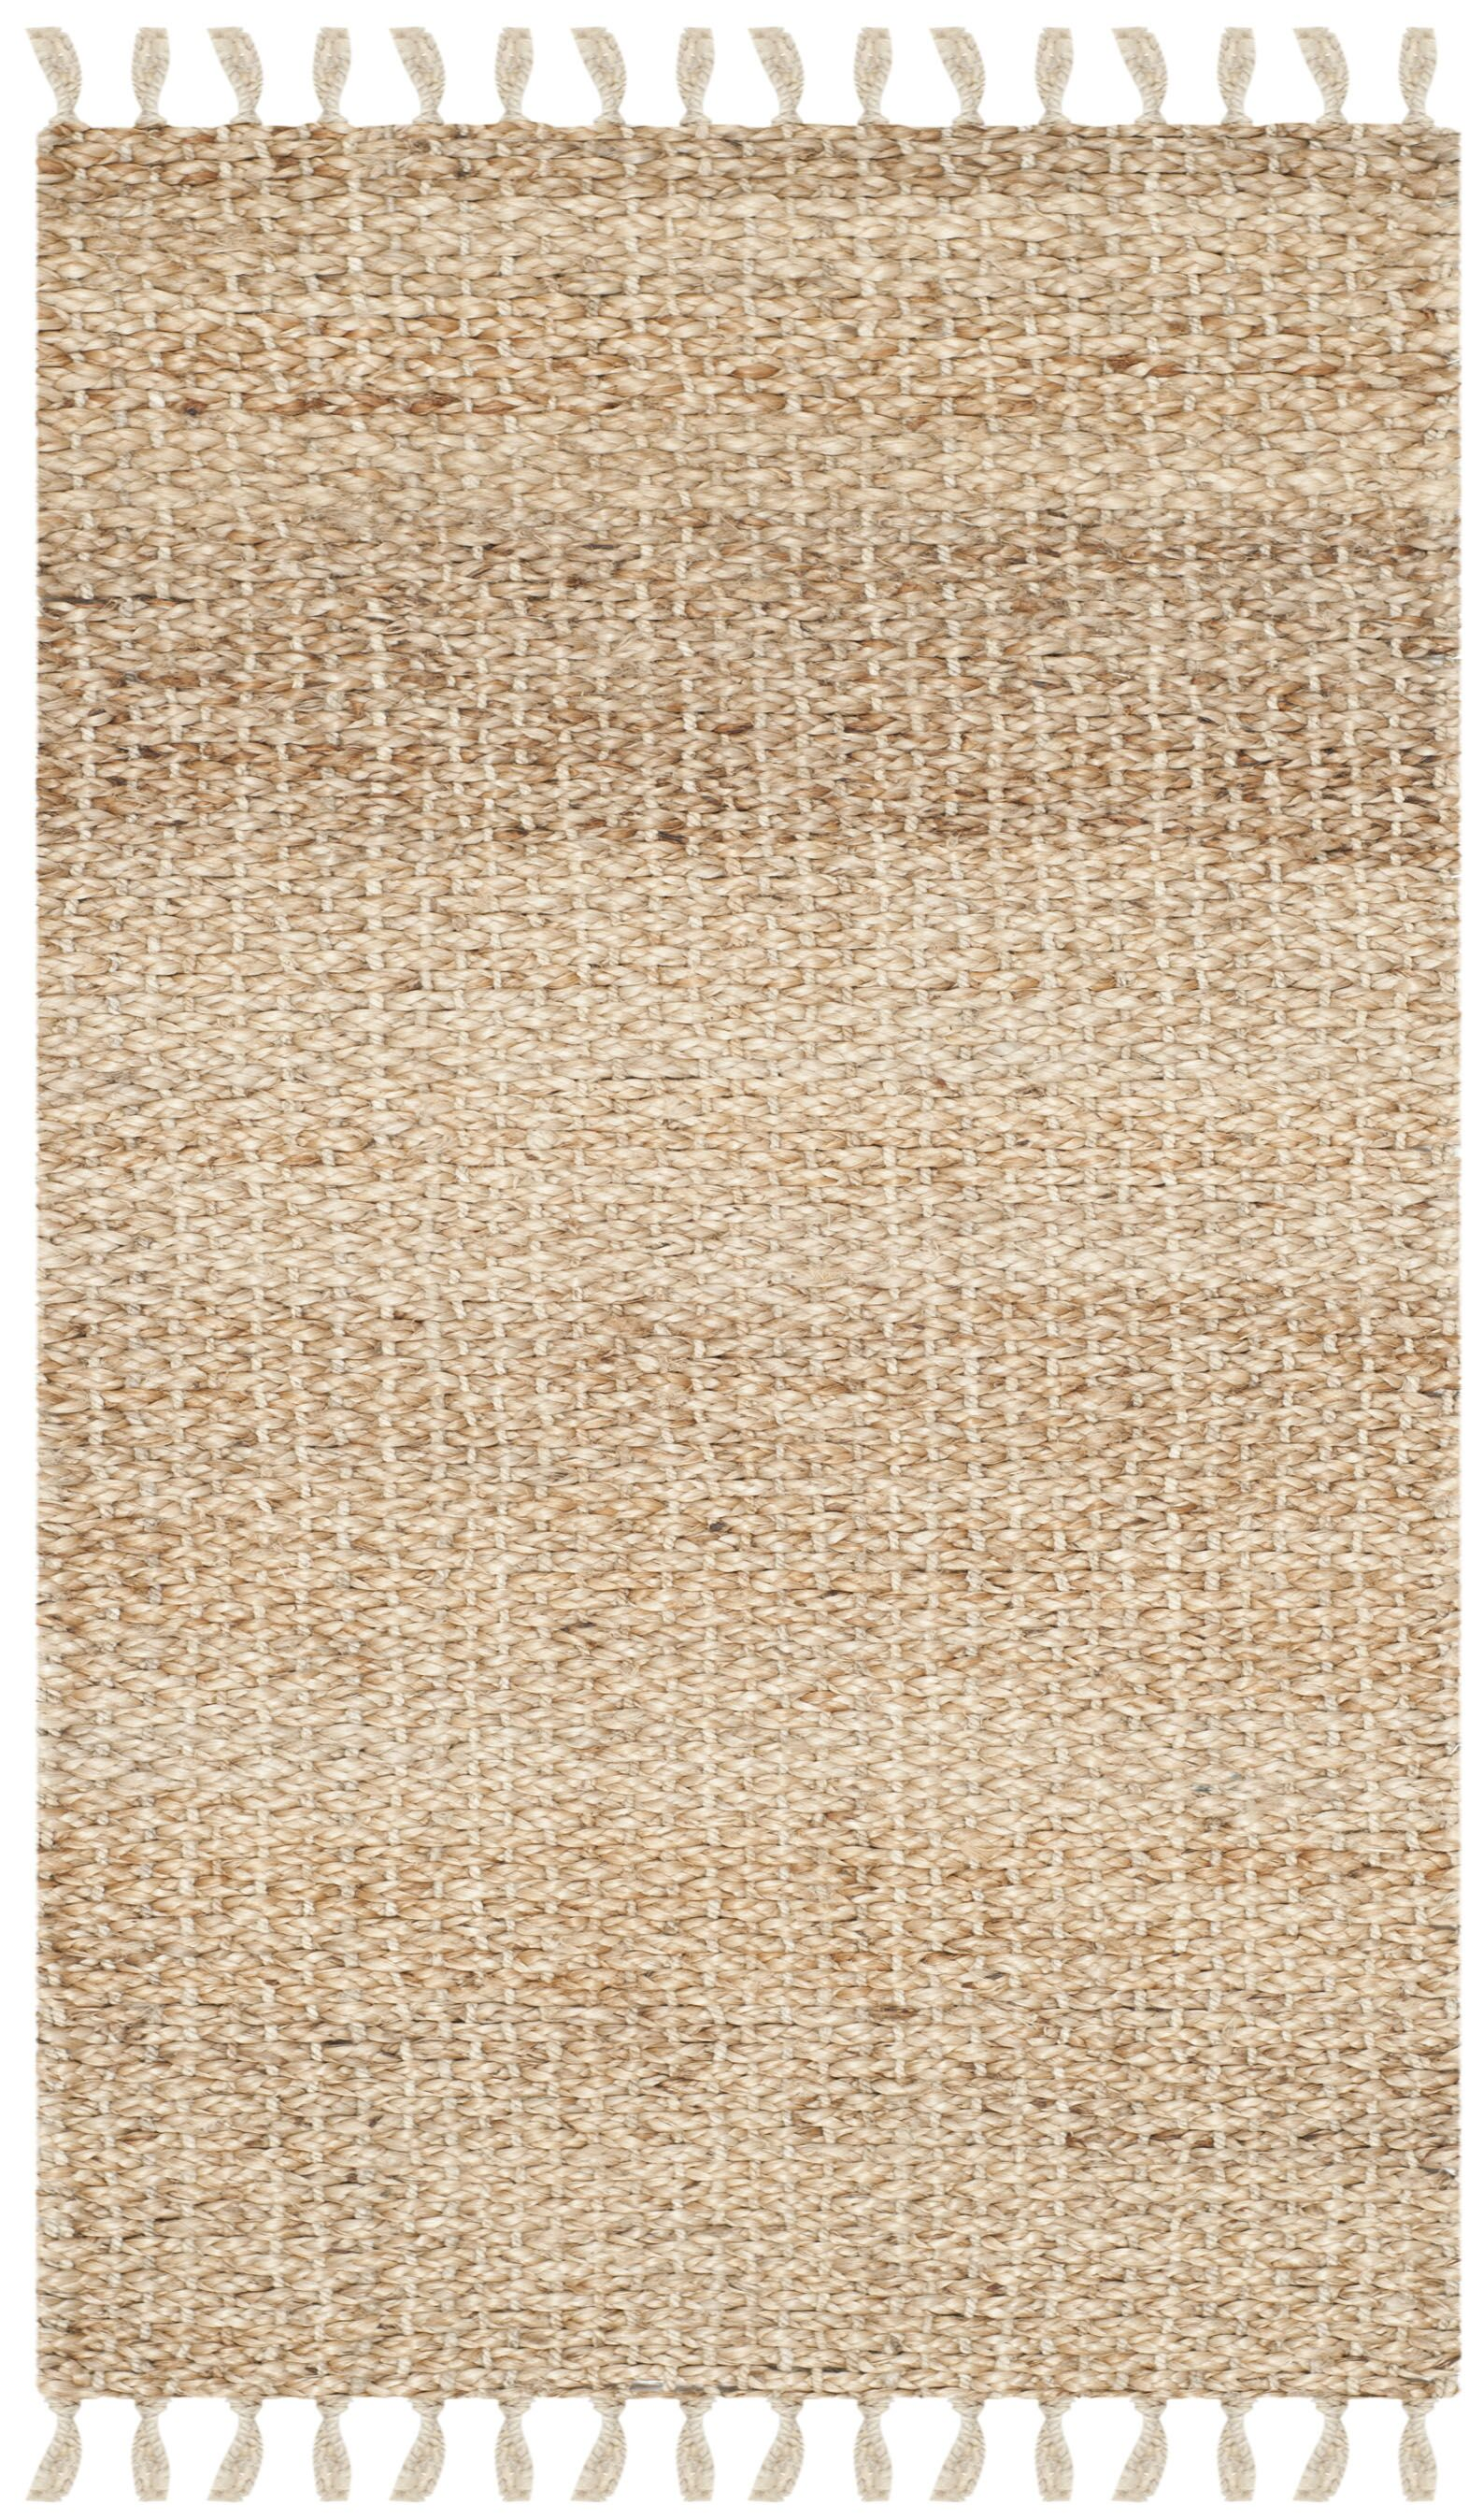 Liza Hand-Woven Natural Area Rug Rug Size: Rectangle 3' x 5'